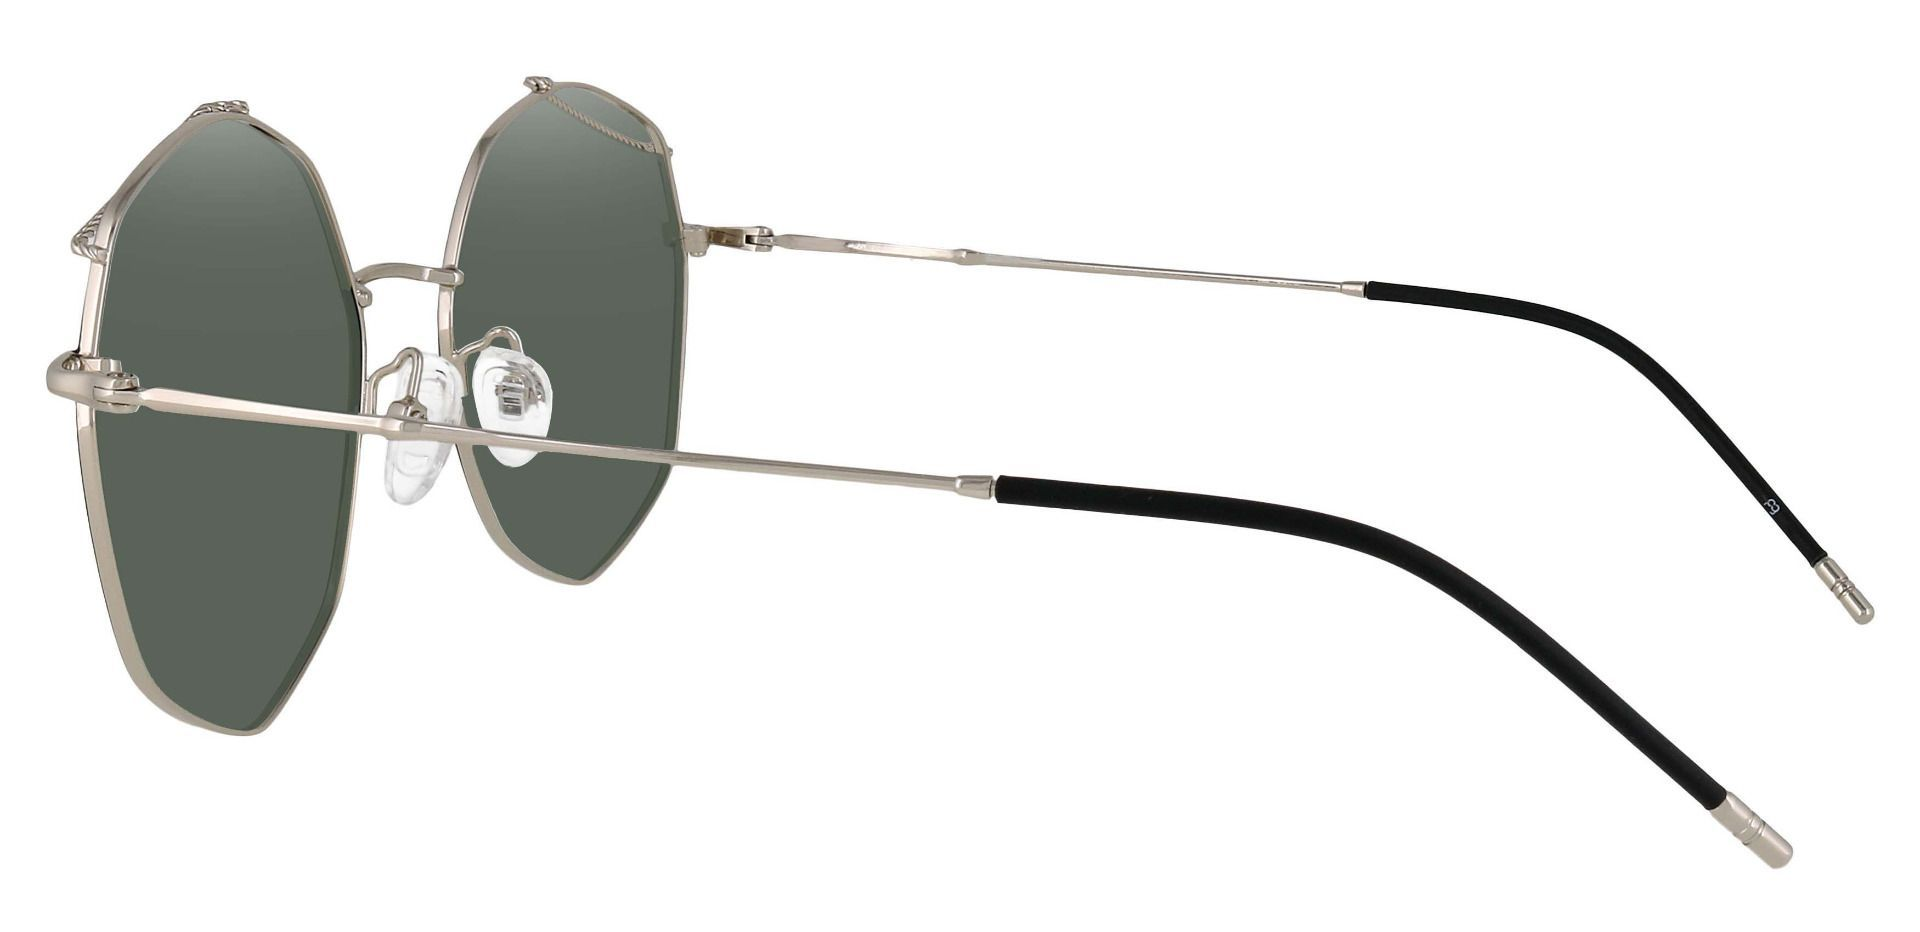 Tango Geometric Prescription Sunglasses - Black Frame With Green Lenses